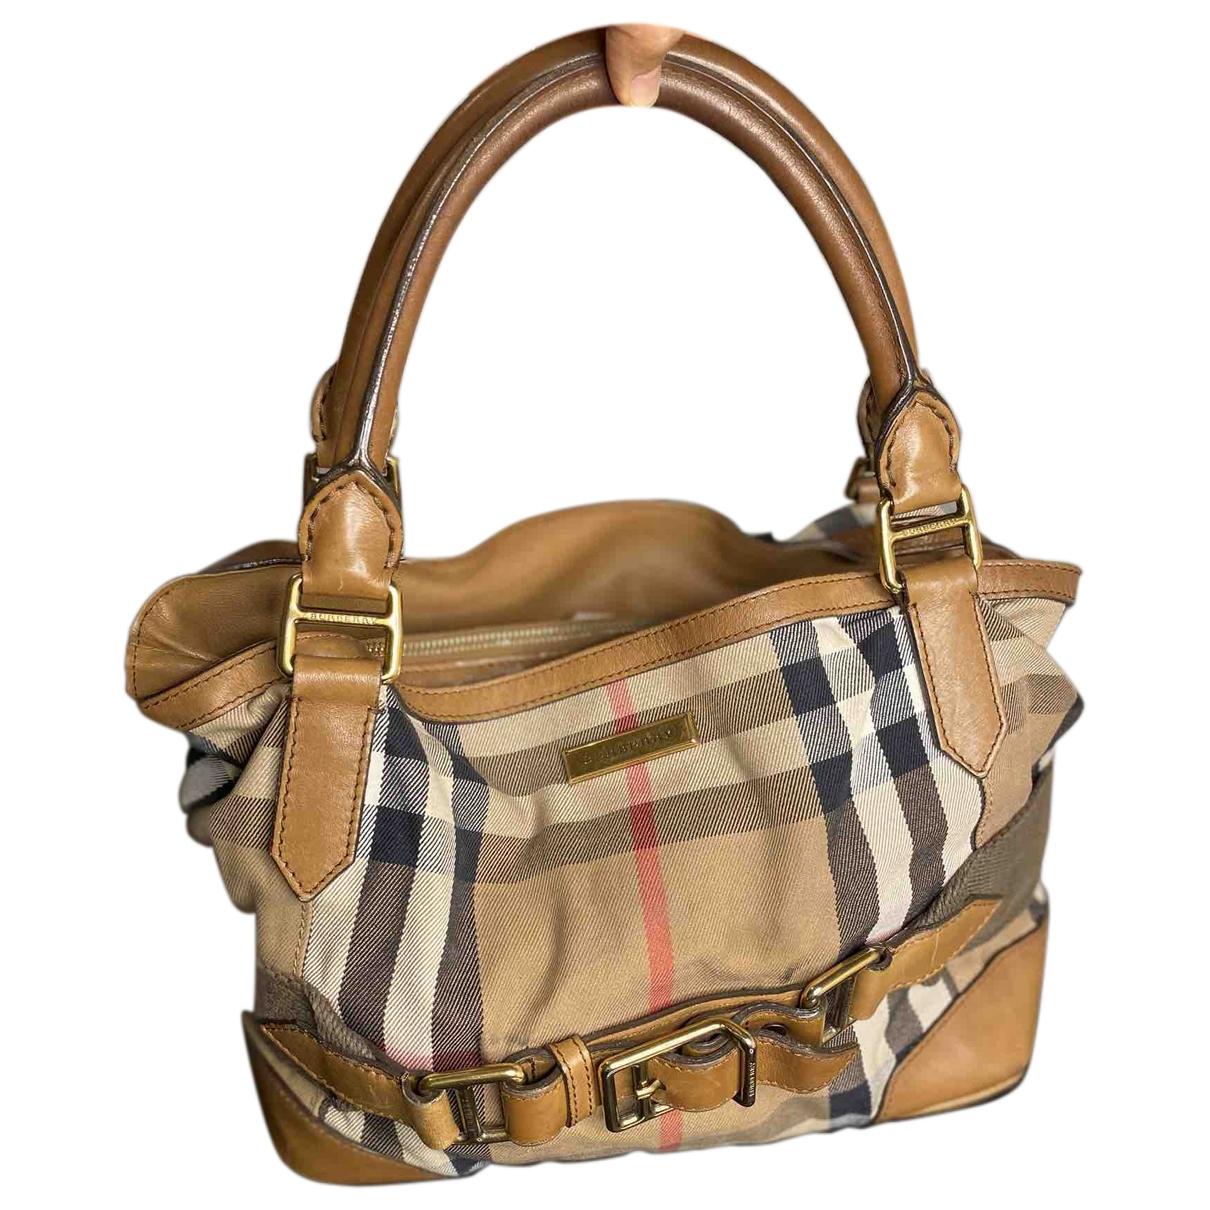 Burberry \N Cloth handbag for Women \N